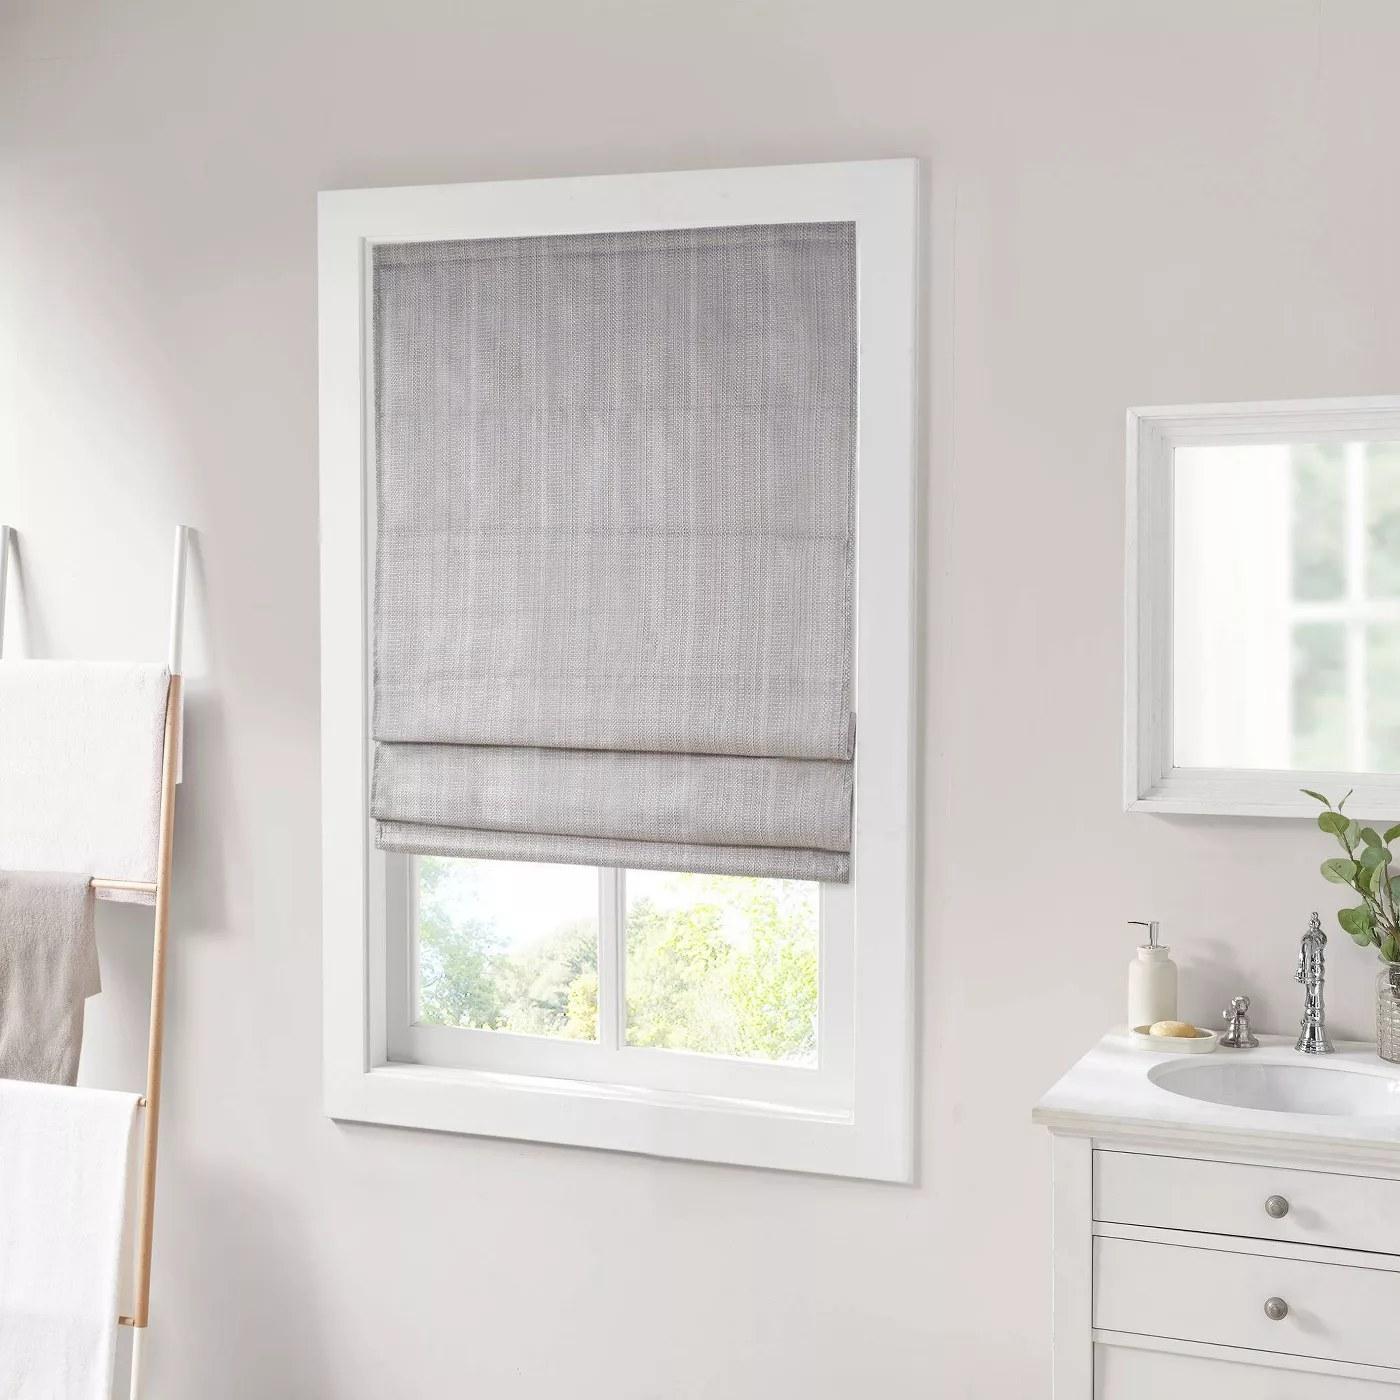 The Roman shade covering a bathroom window